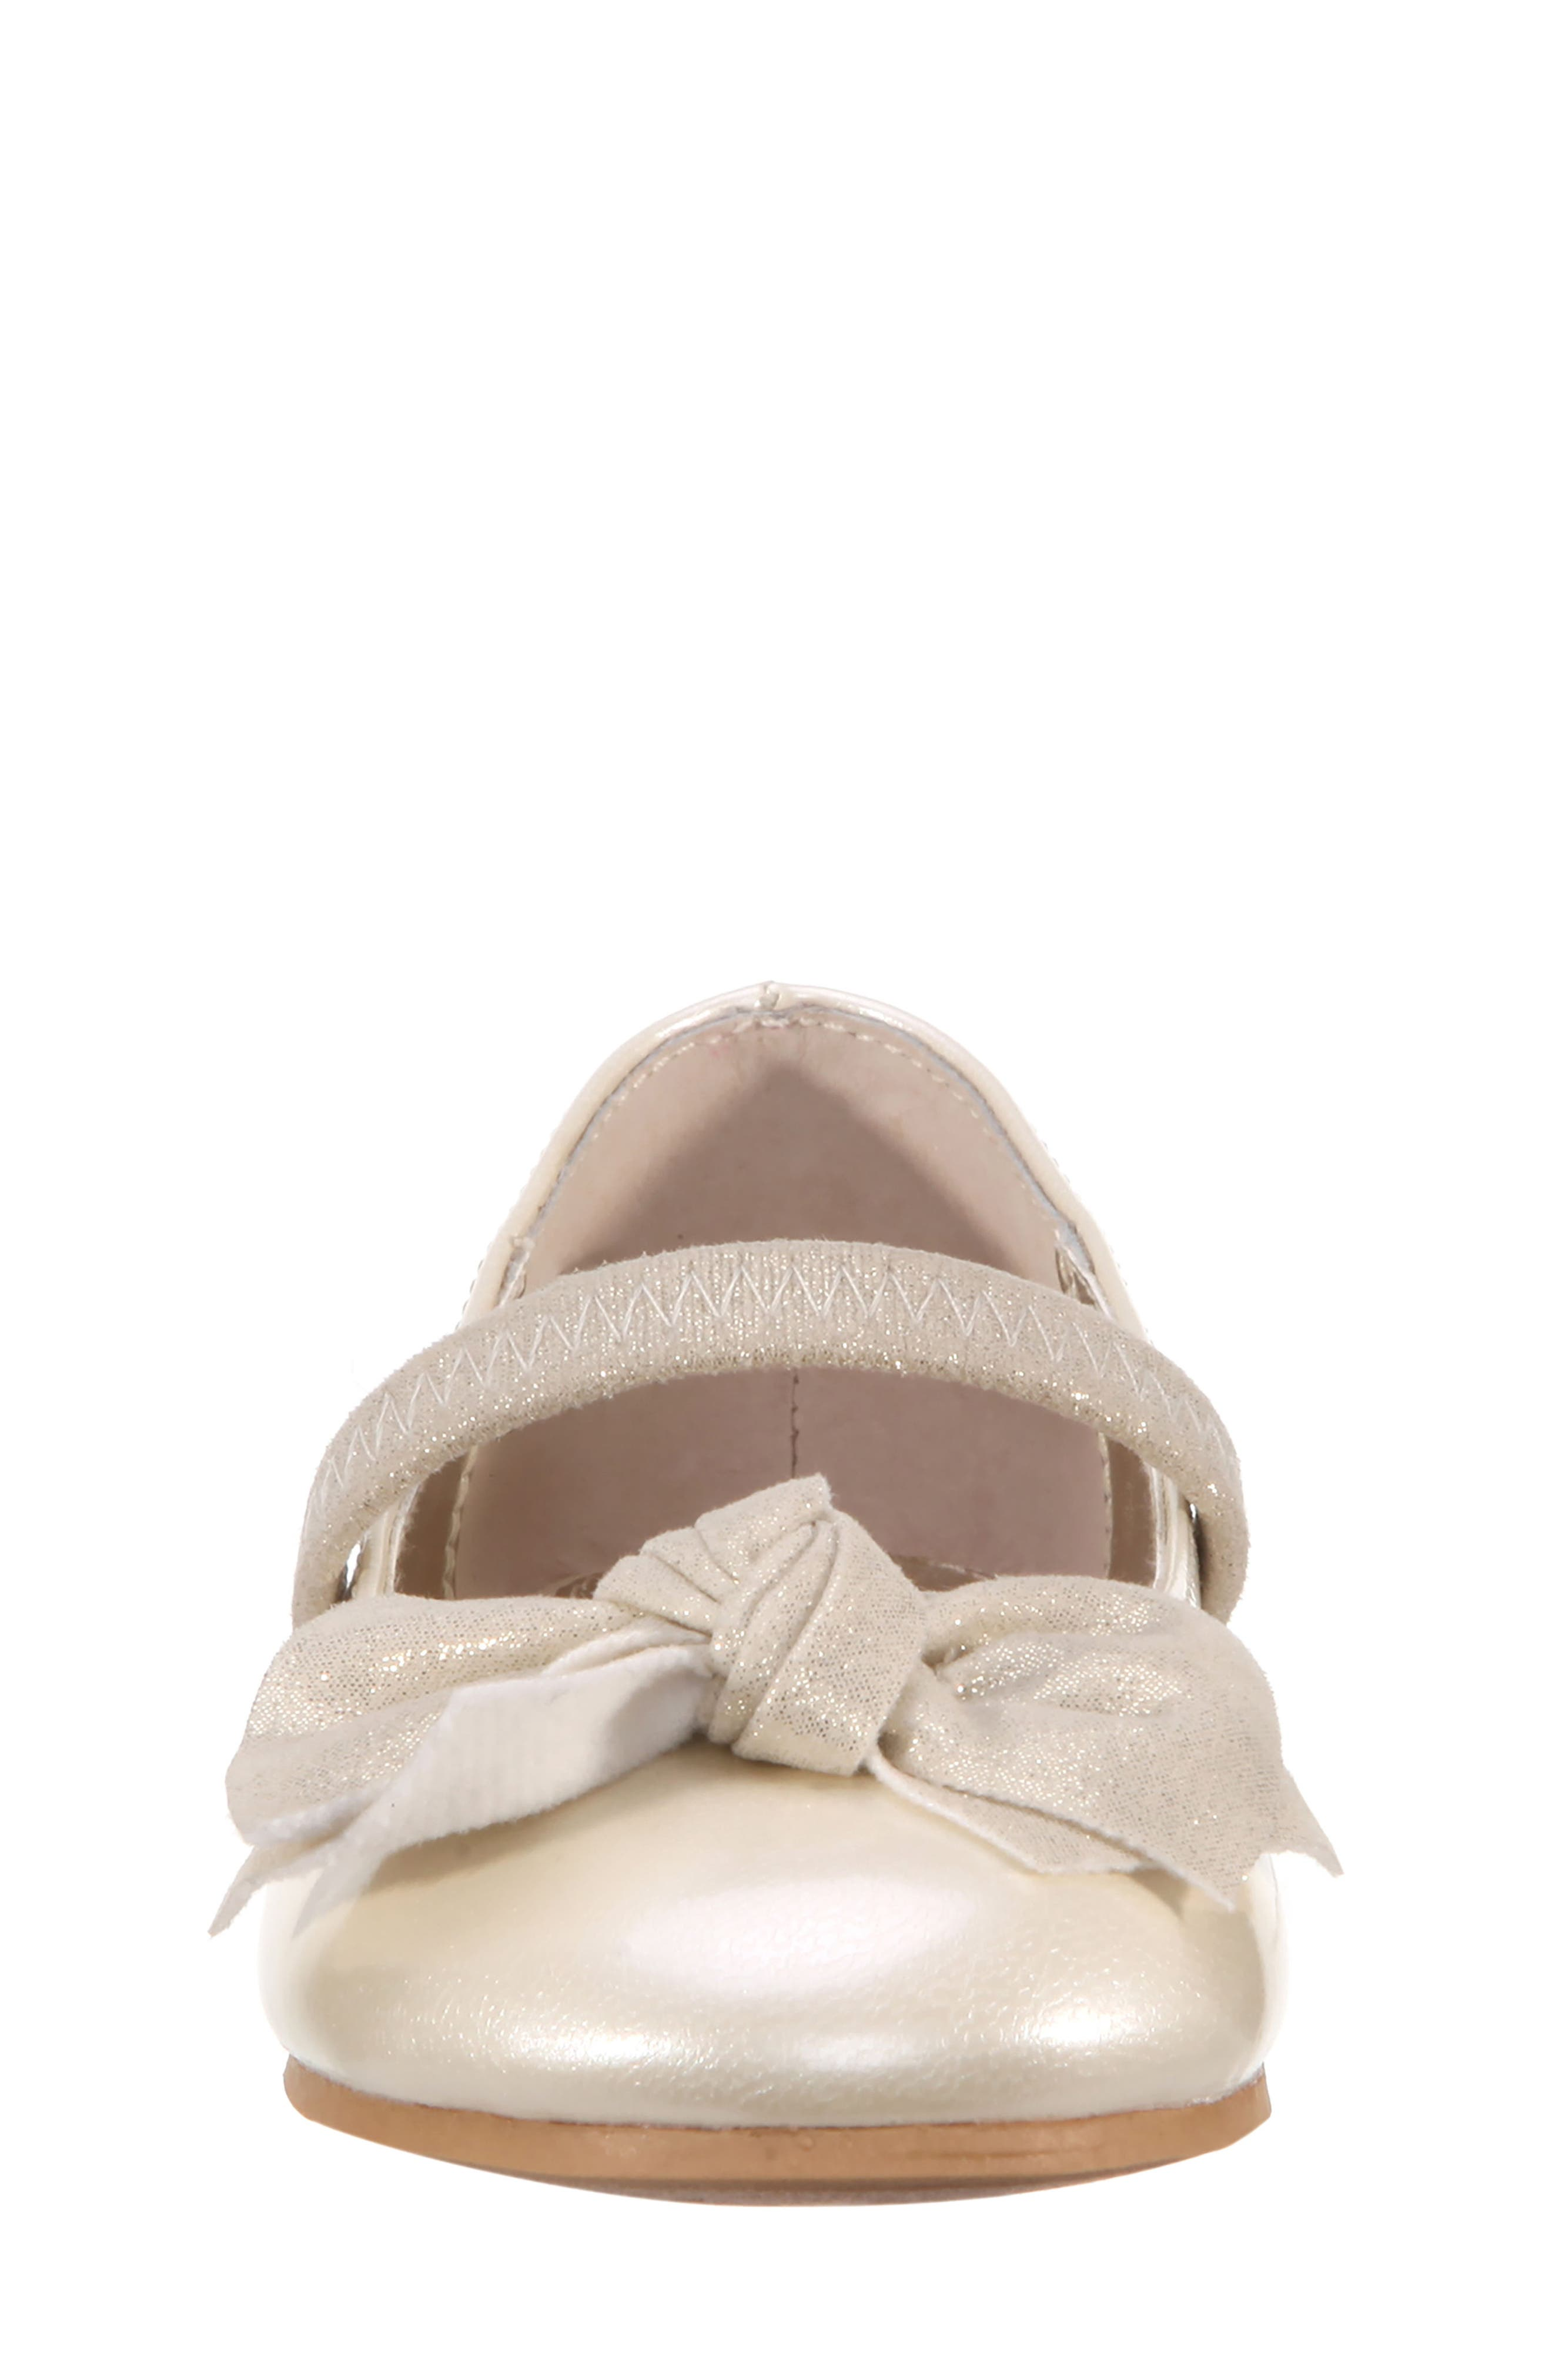 Kaytelyn-T Glitter Bow Ballet Flat,                             Alternate thumbnail 28, color,